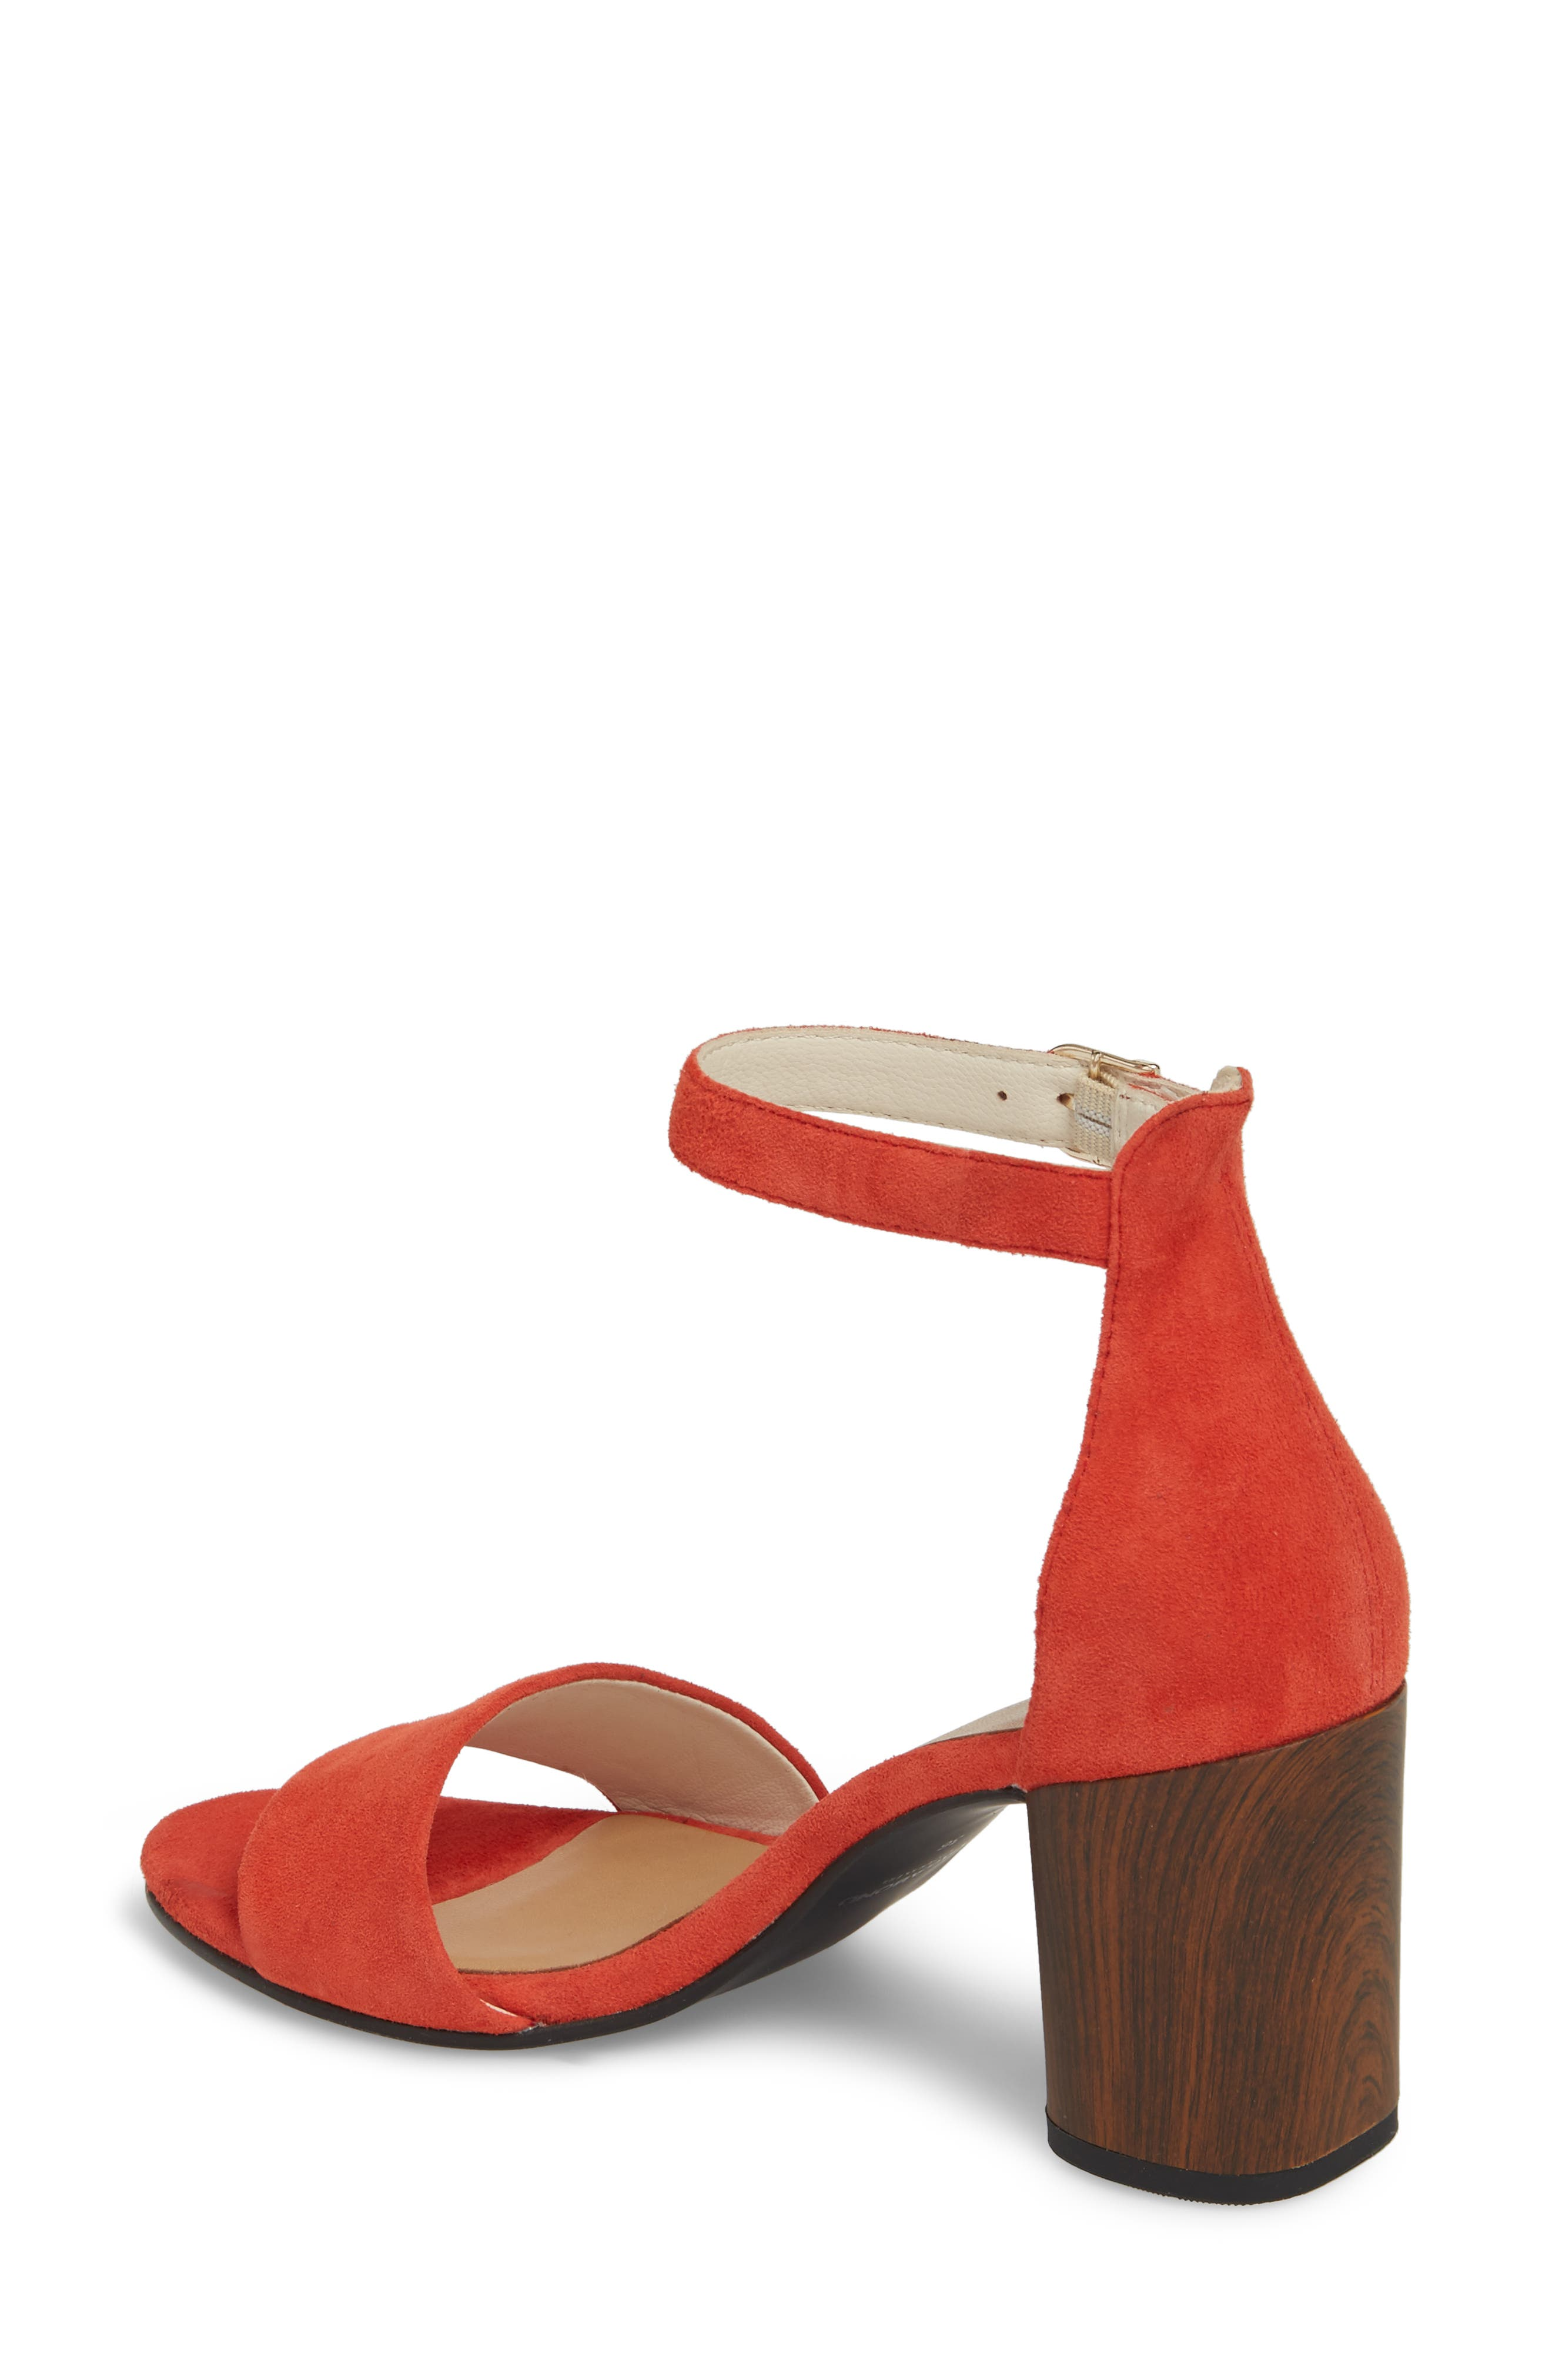 Carol Ankle Strap Sandal,                             Alternate thumbnail 2, color,                             Coral Suede